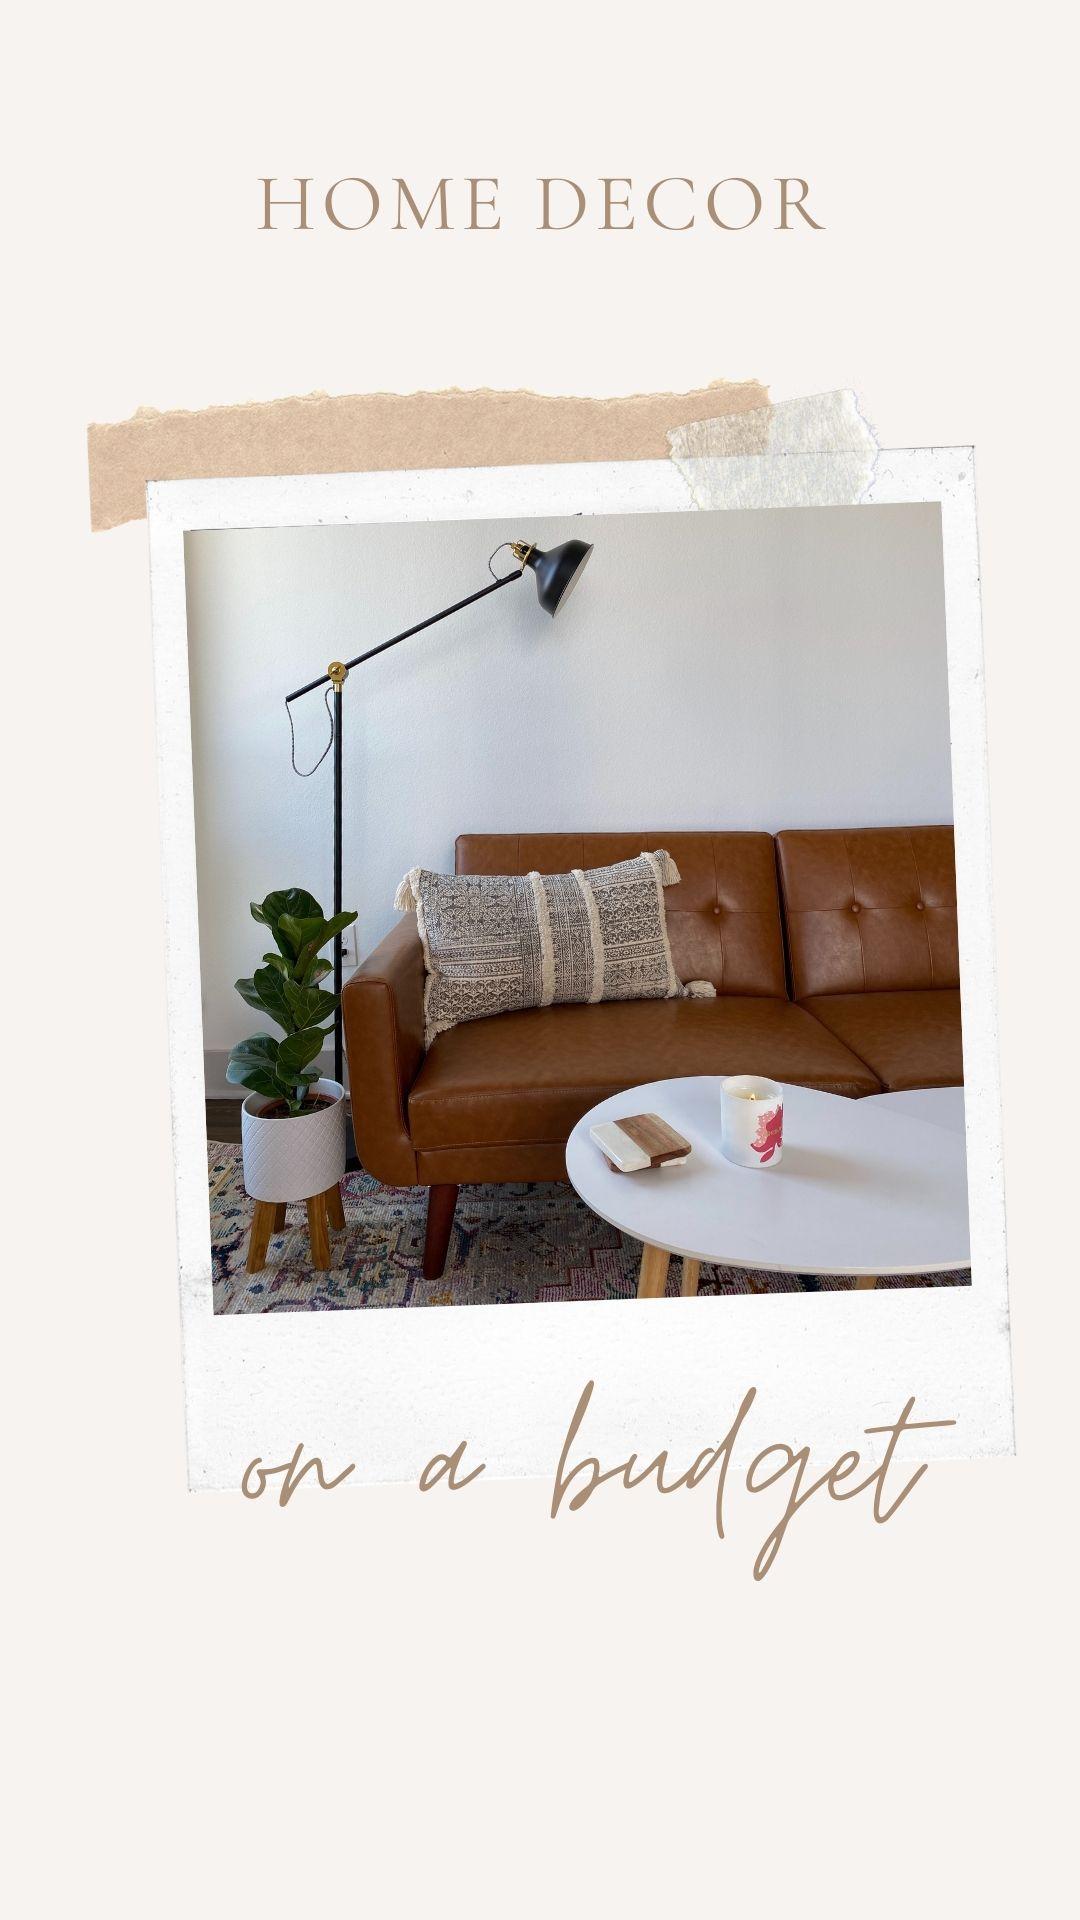 home decor on a budget!